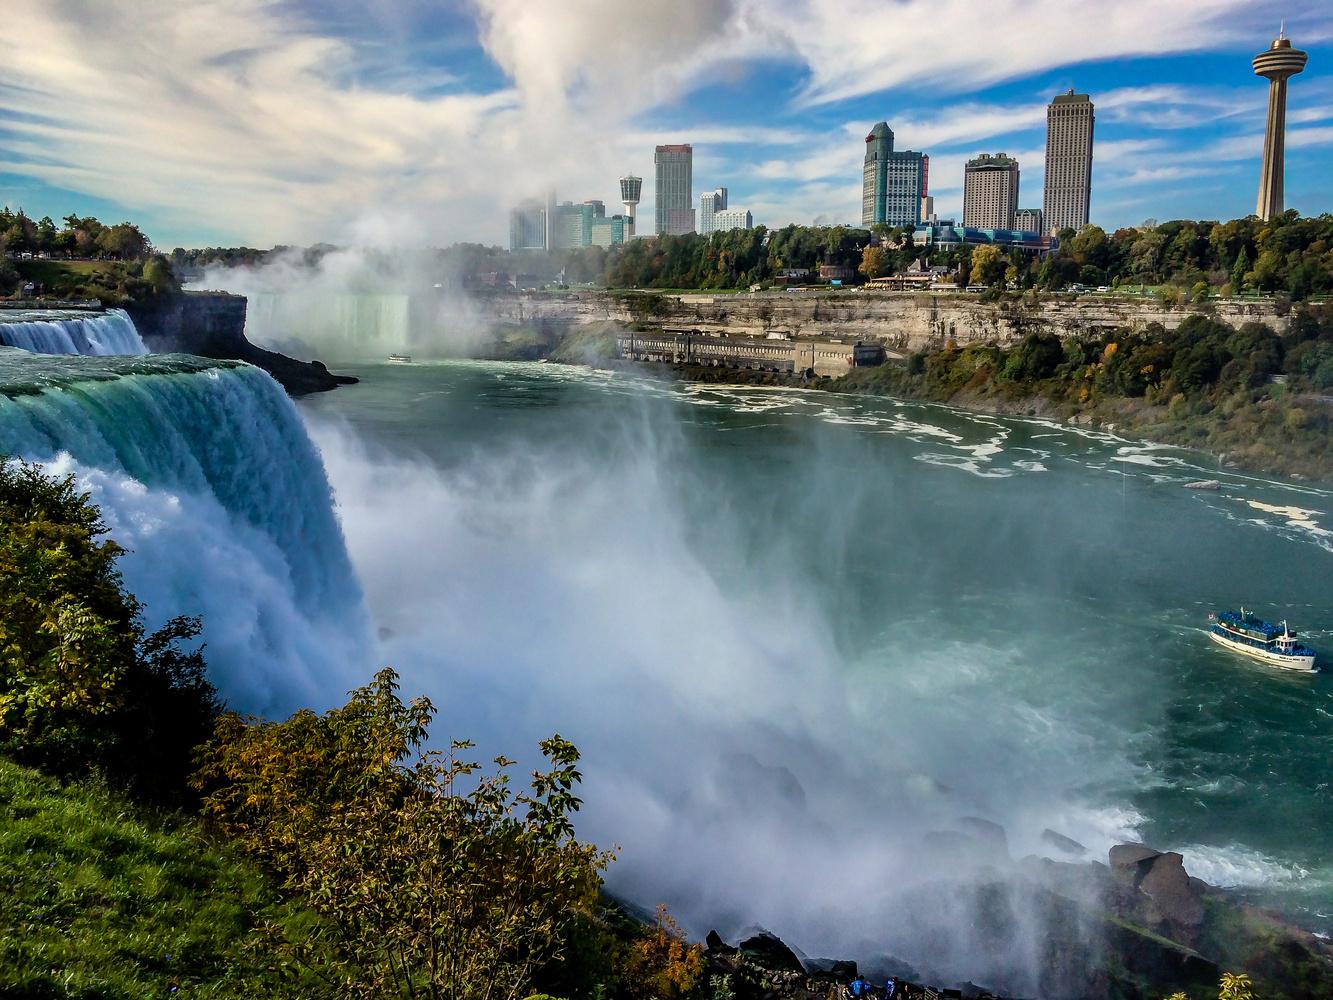 Niagara Falls by Roger Lorenz